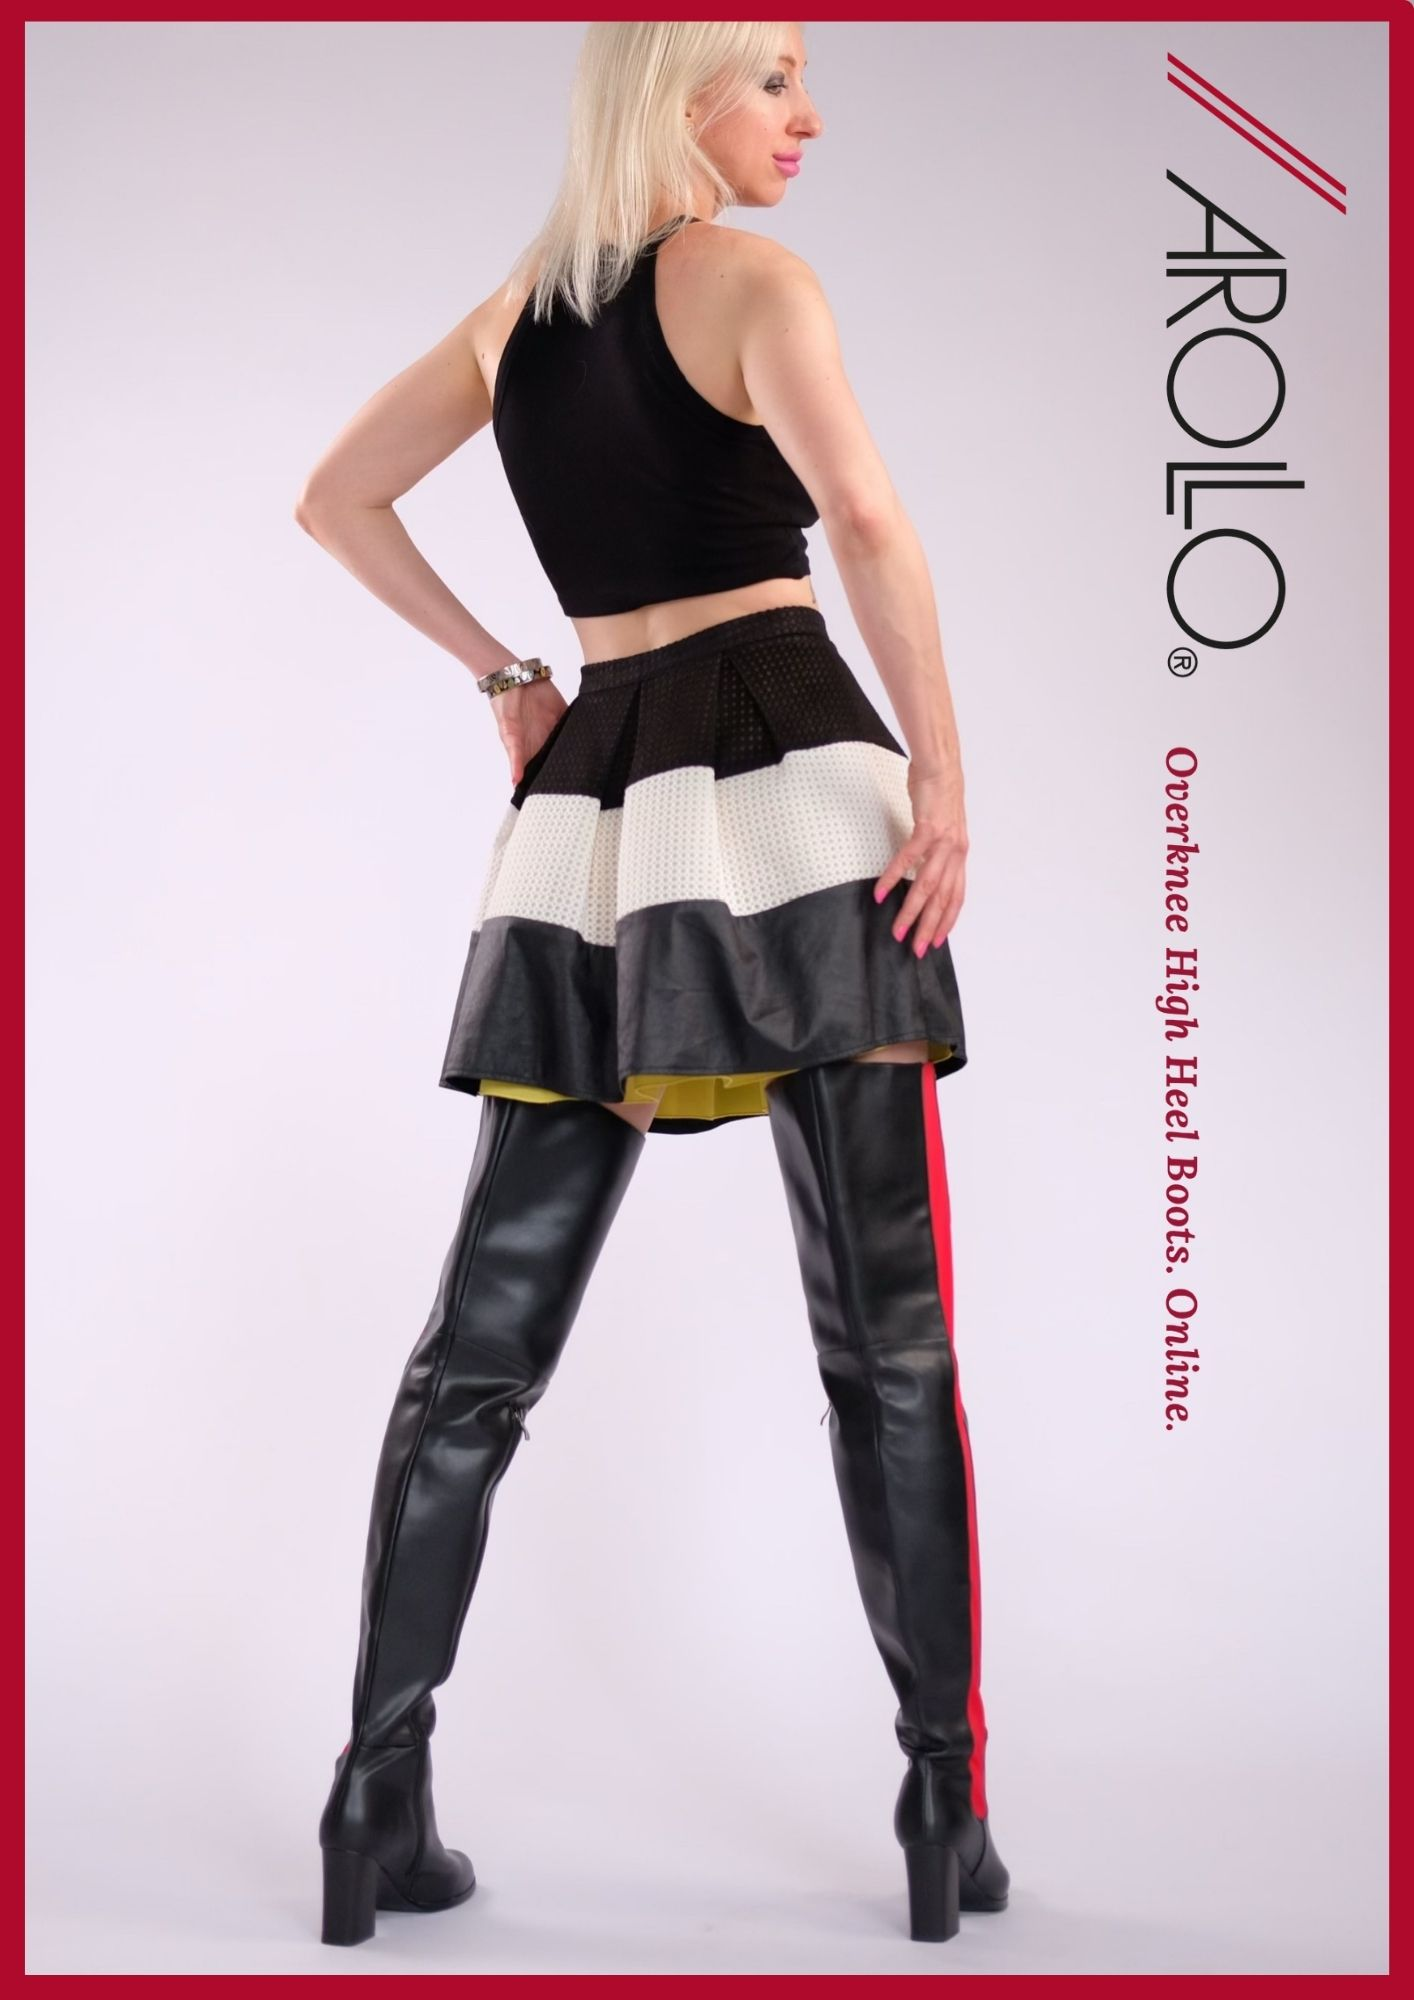 9cm blocked heel boots by Arollo